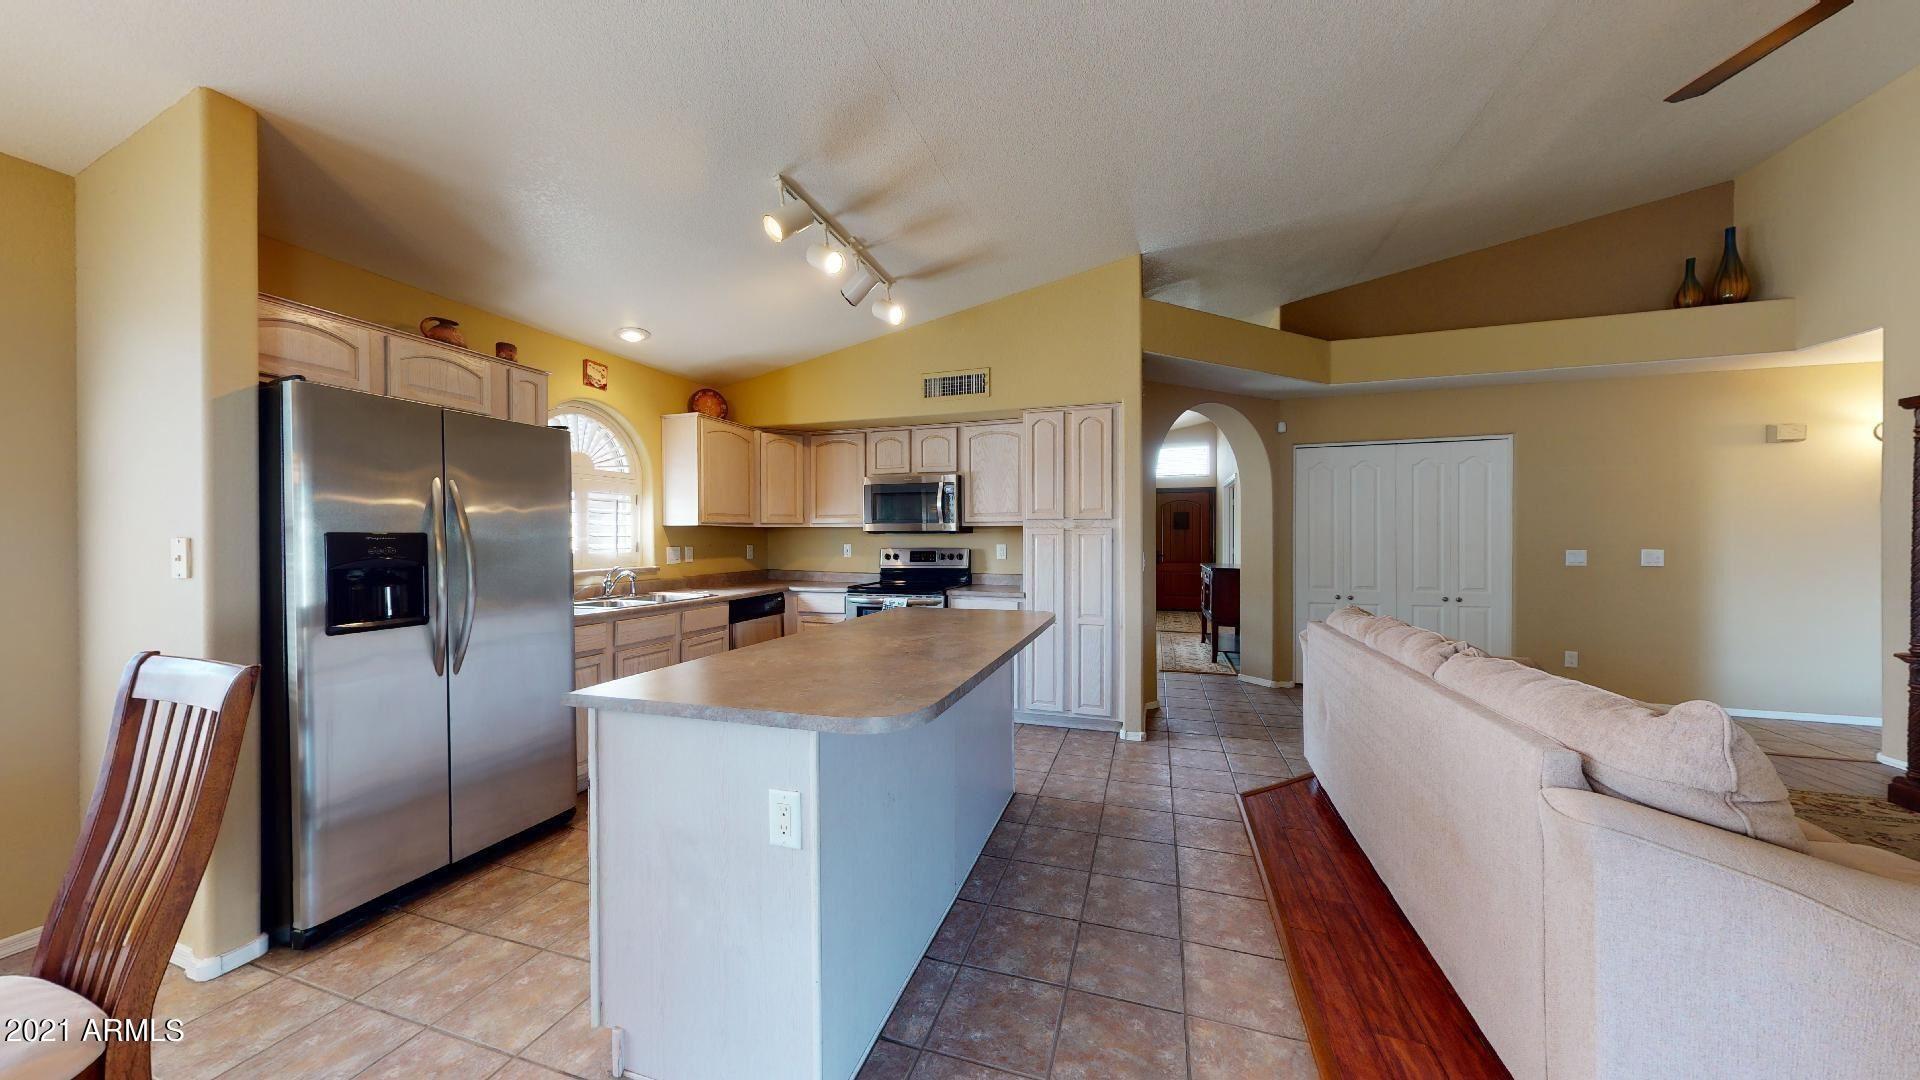 Photo of 2701 N 127TH Avenue, Avondale, AZ 85392 (MLS # 6304605)